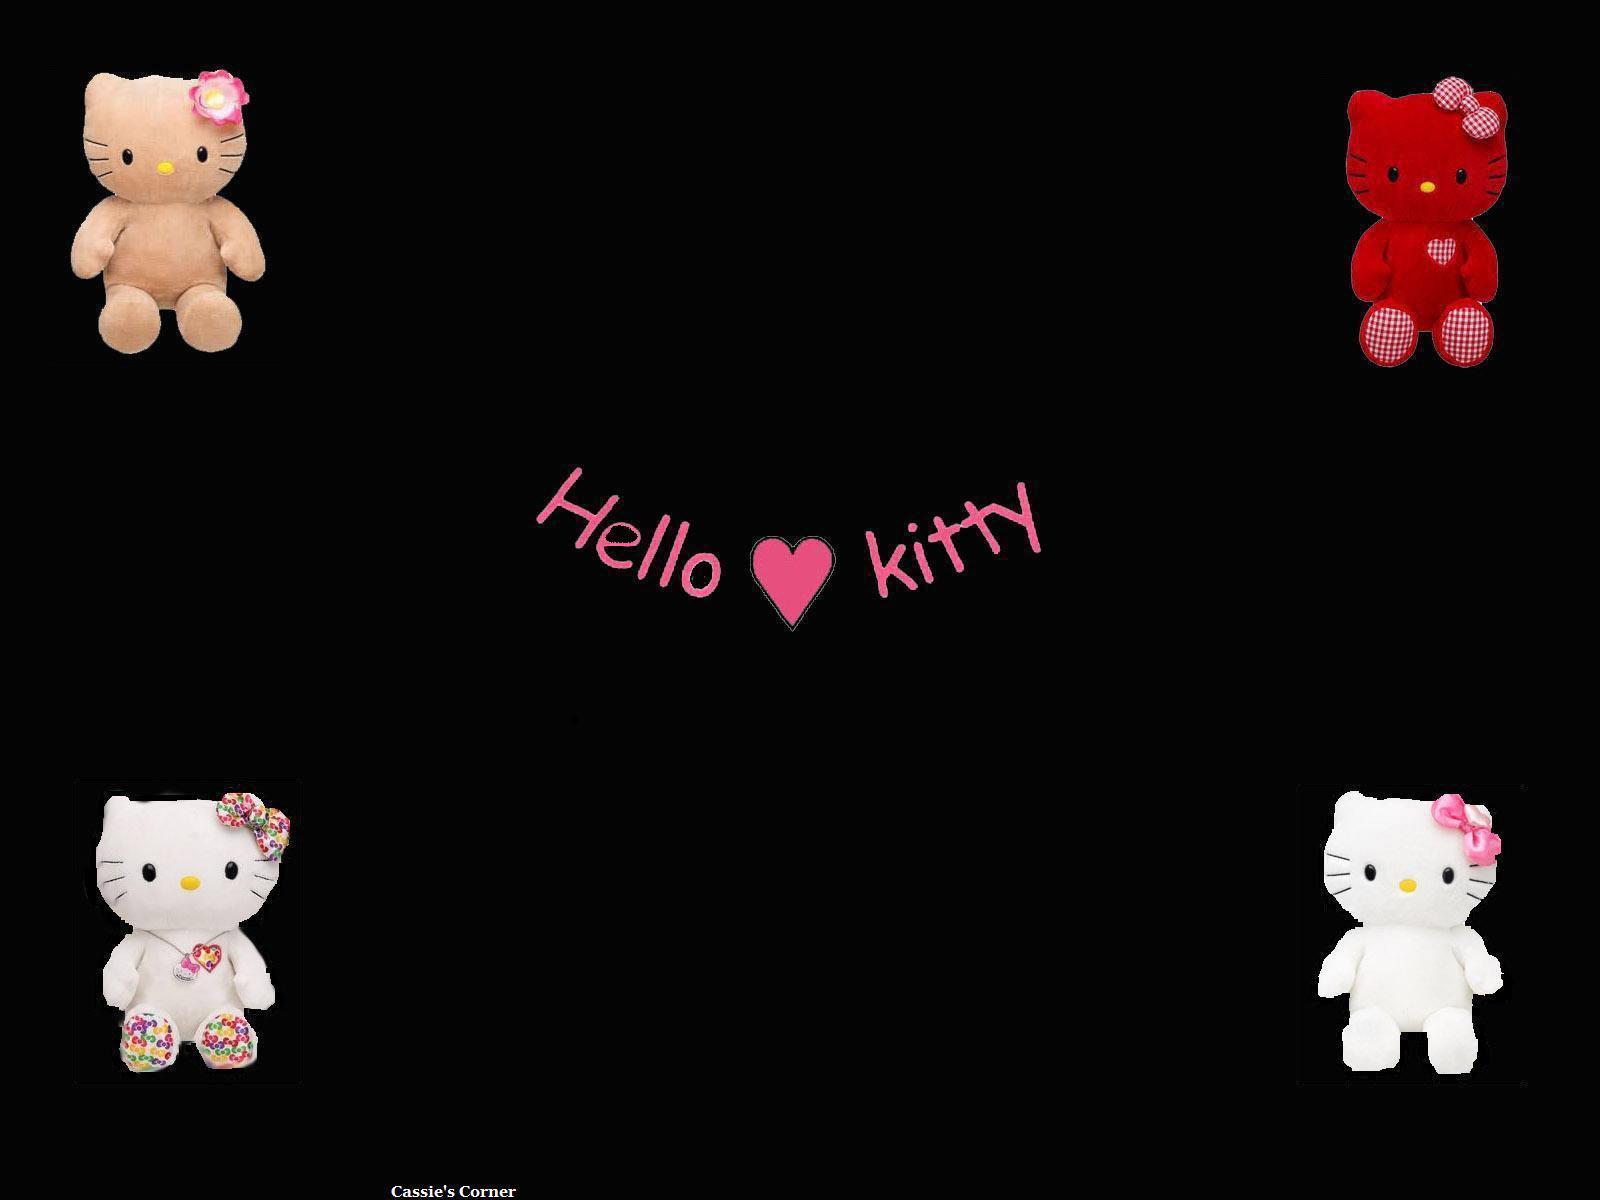 Black Hello Kitty Backgrounds - Wallpaper Cave  Black Hello Kit...